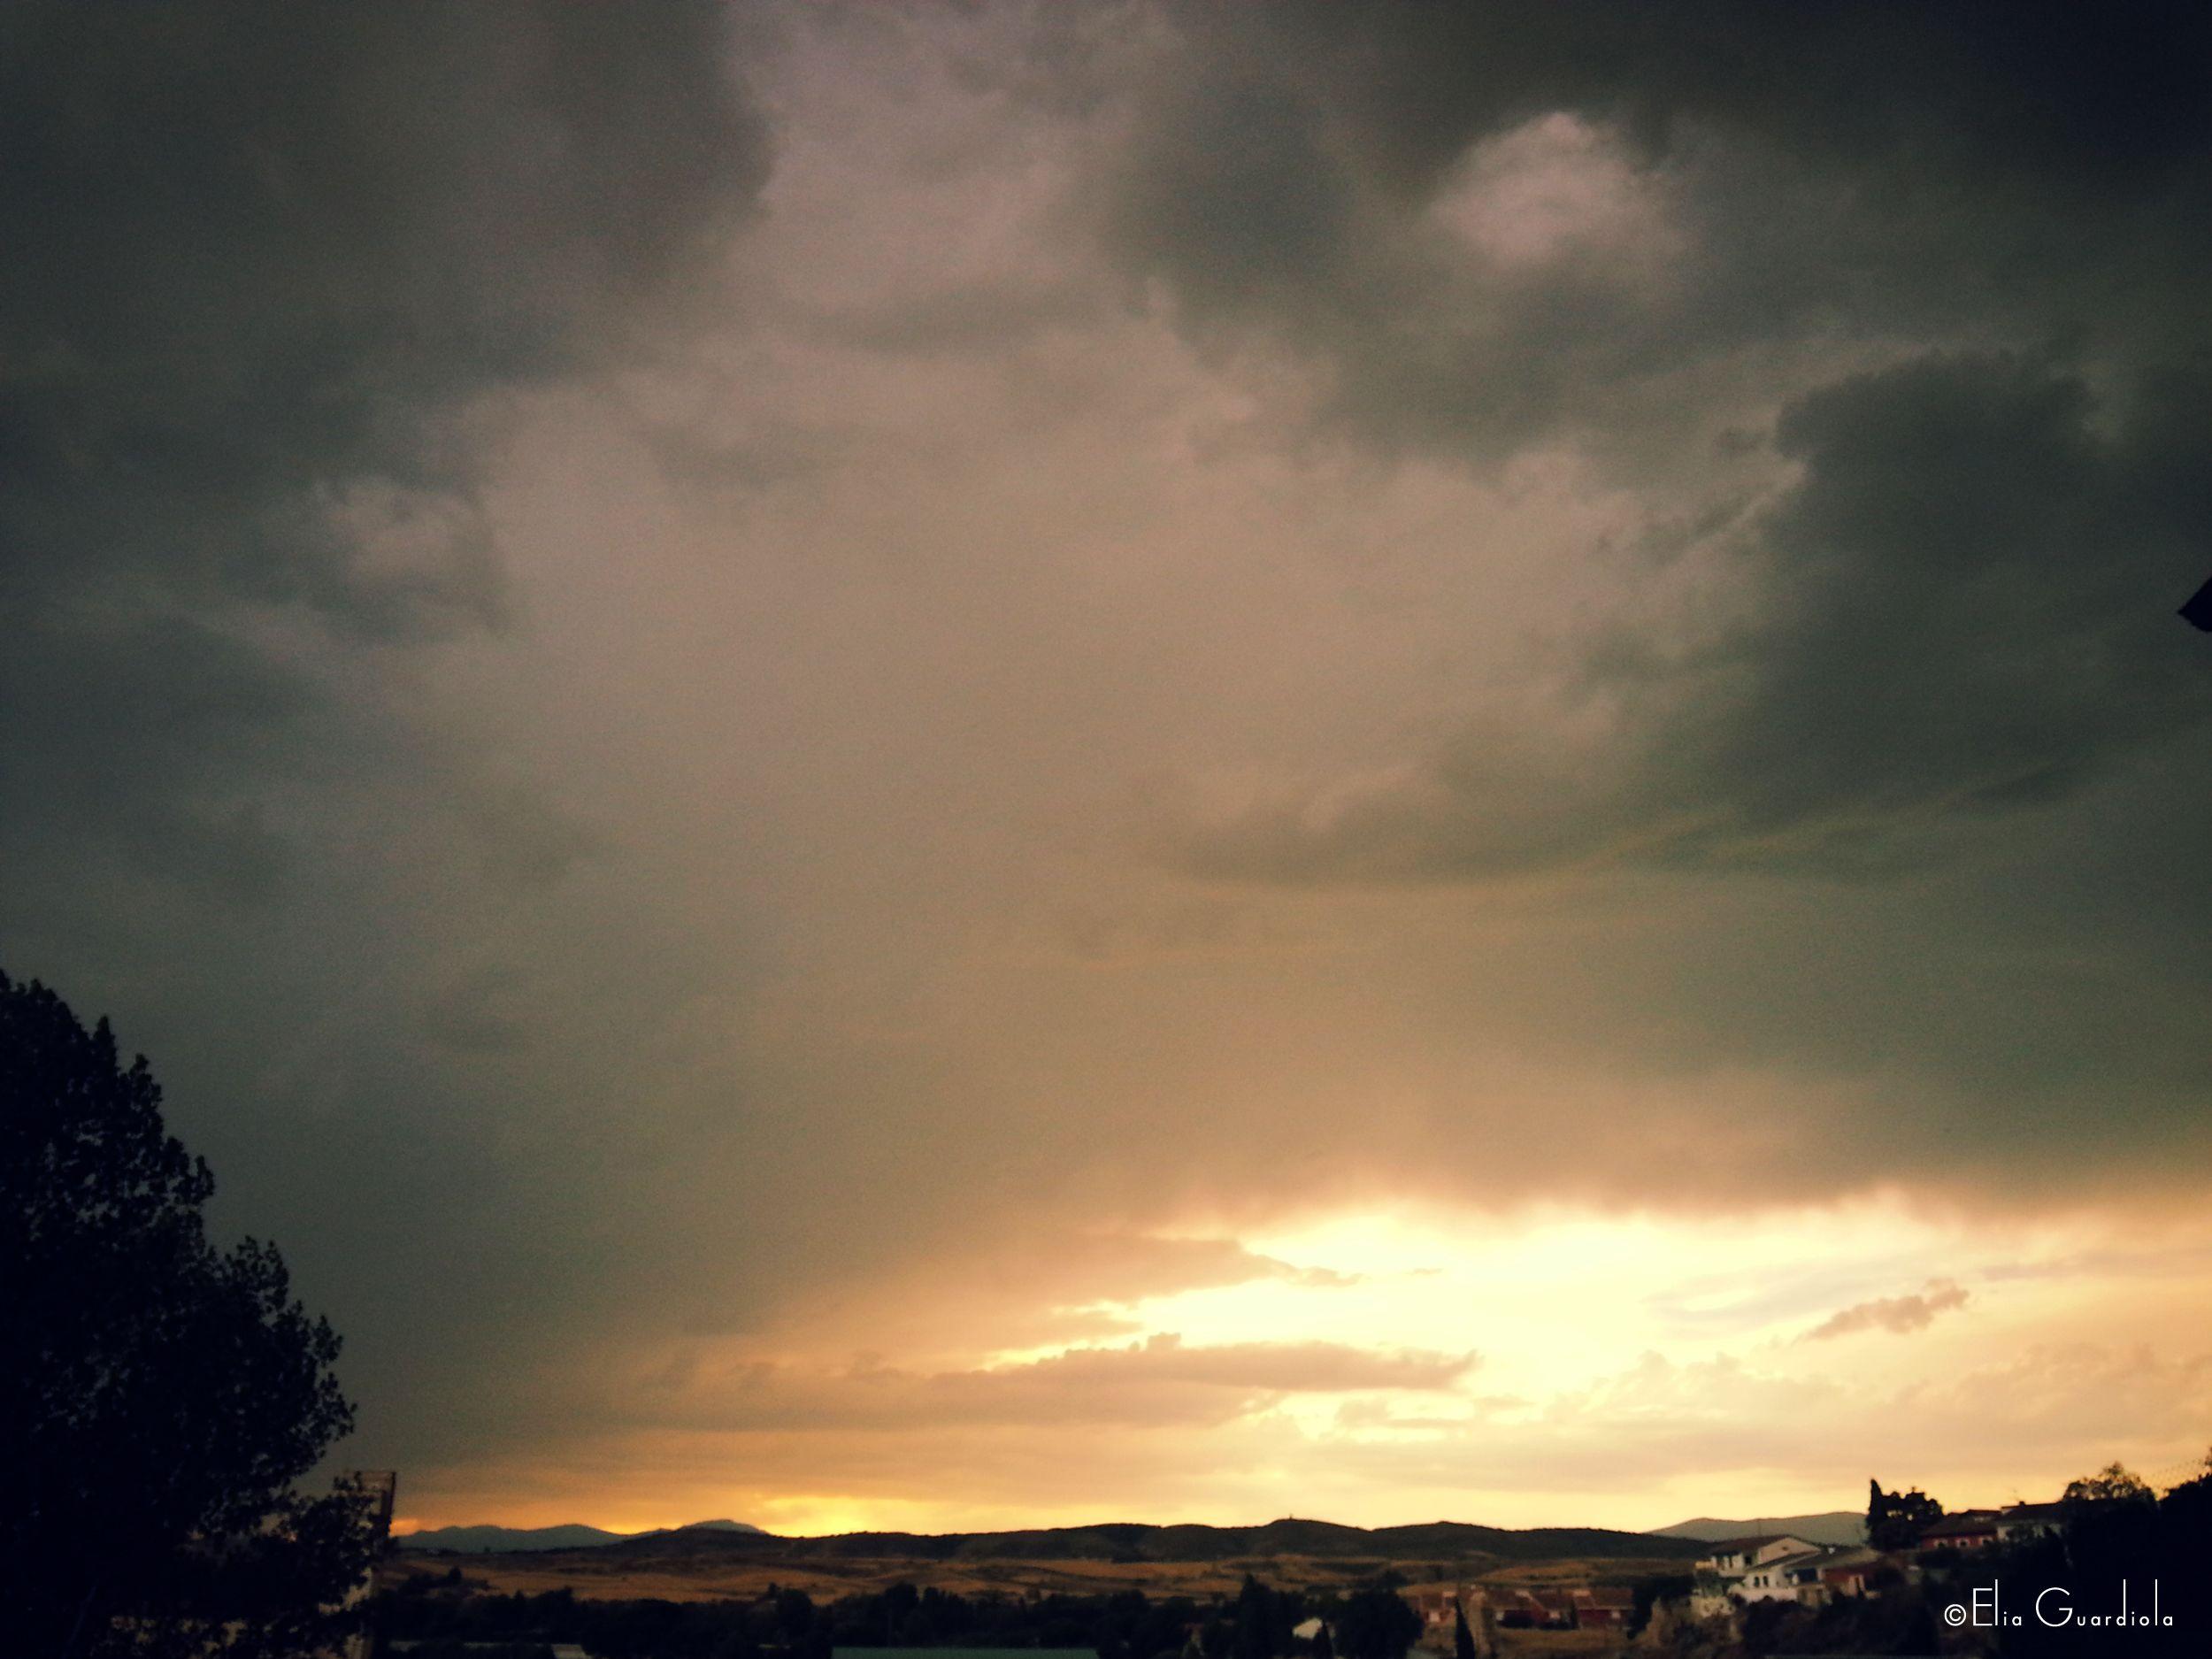 #skylovers #skyphotography #sunsets #sunsetphotography #skycolours #skies #landscape #landscapephotography #madrid